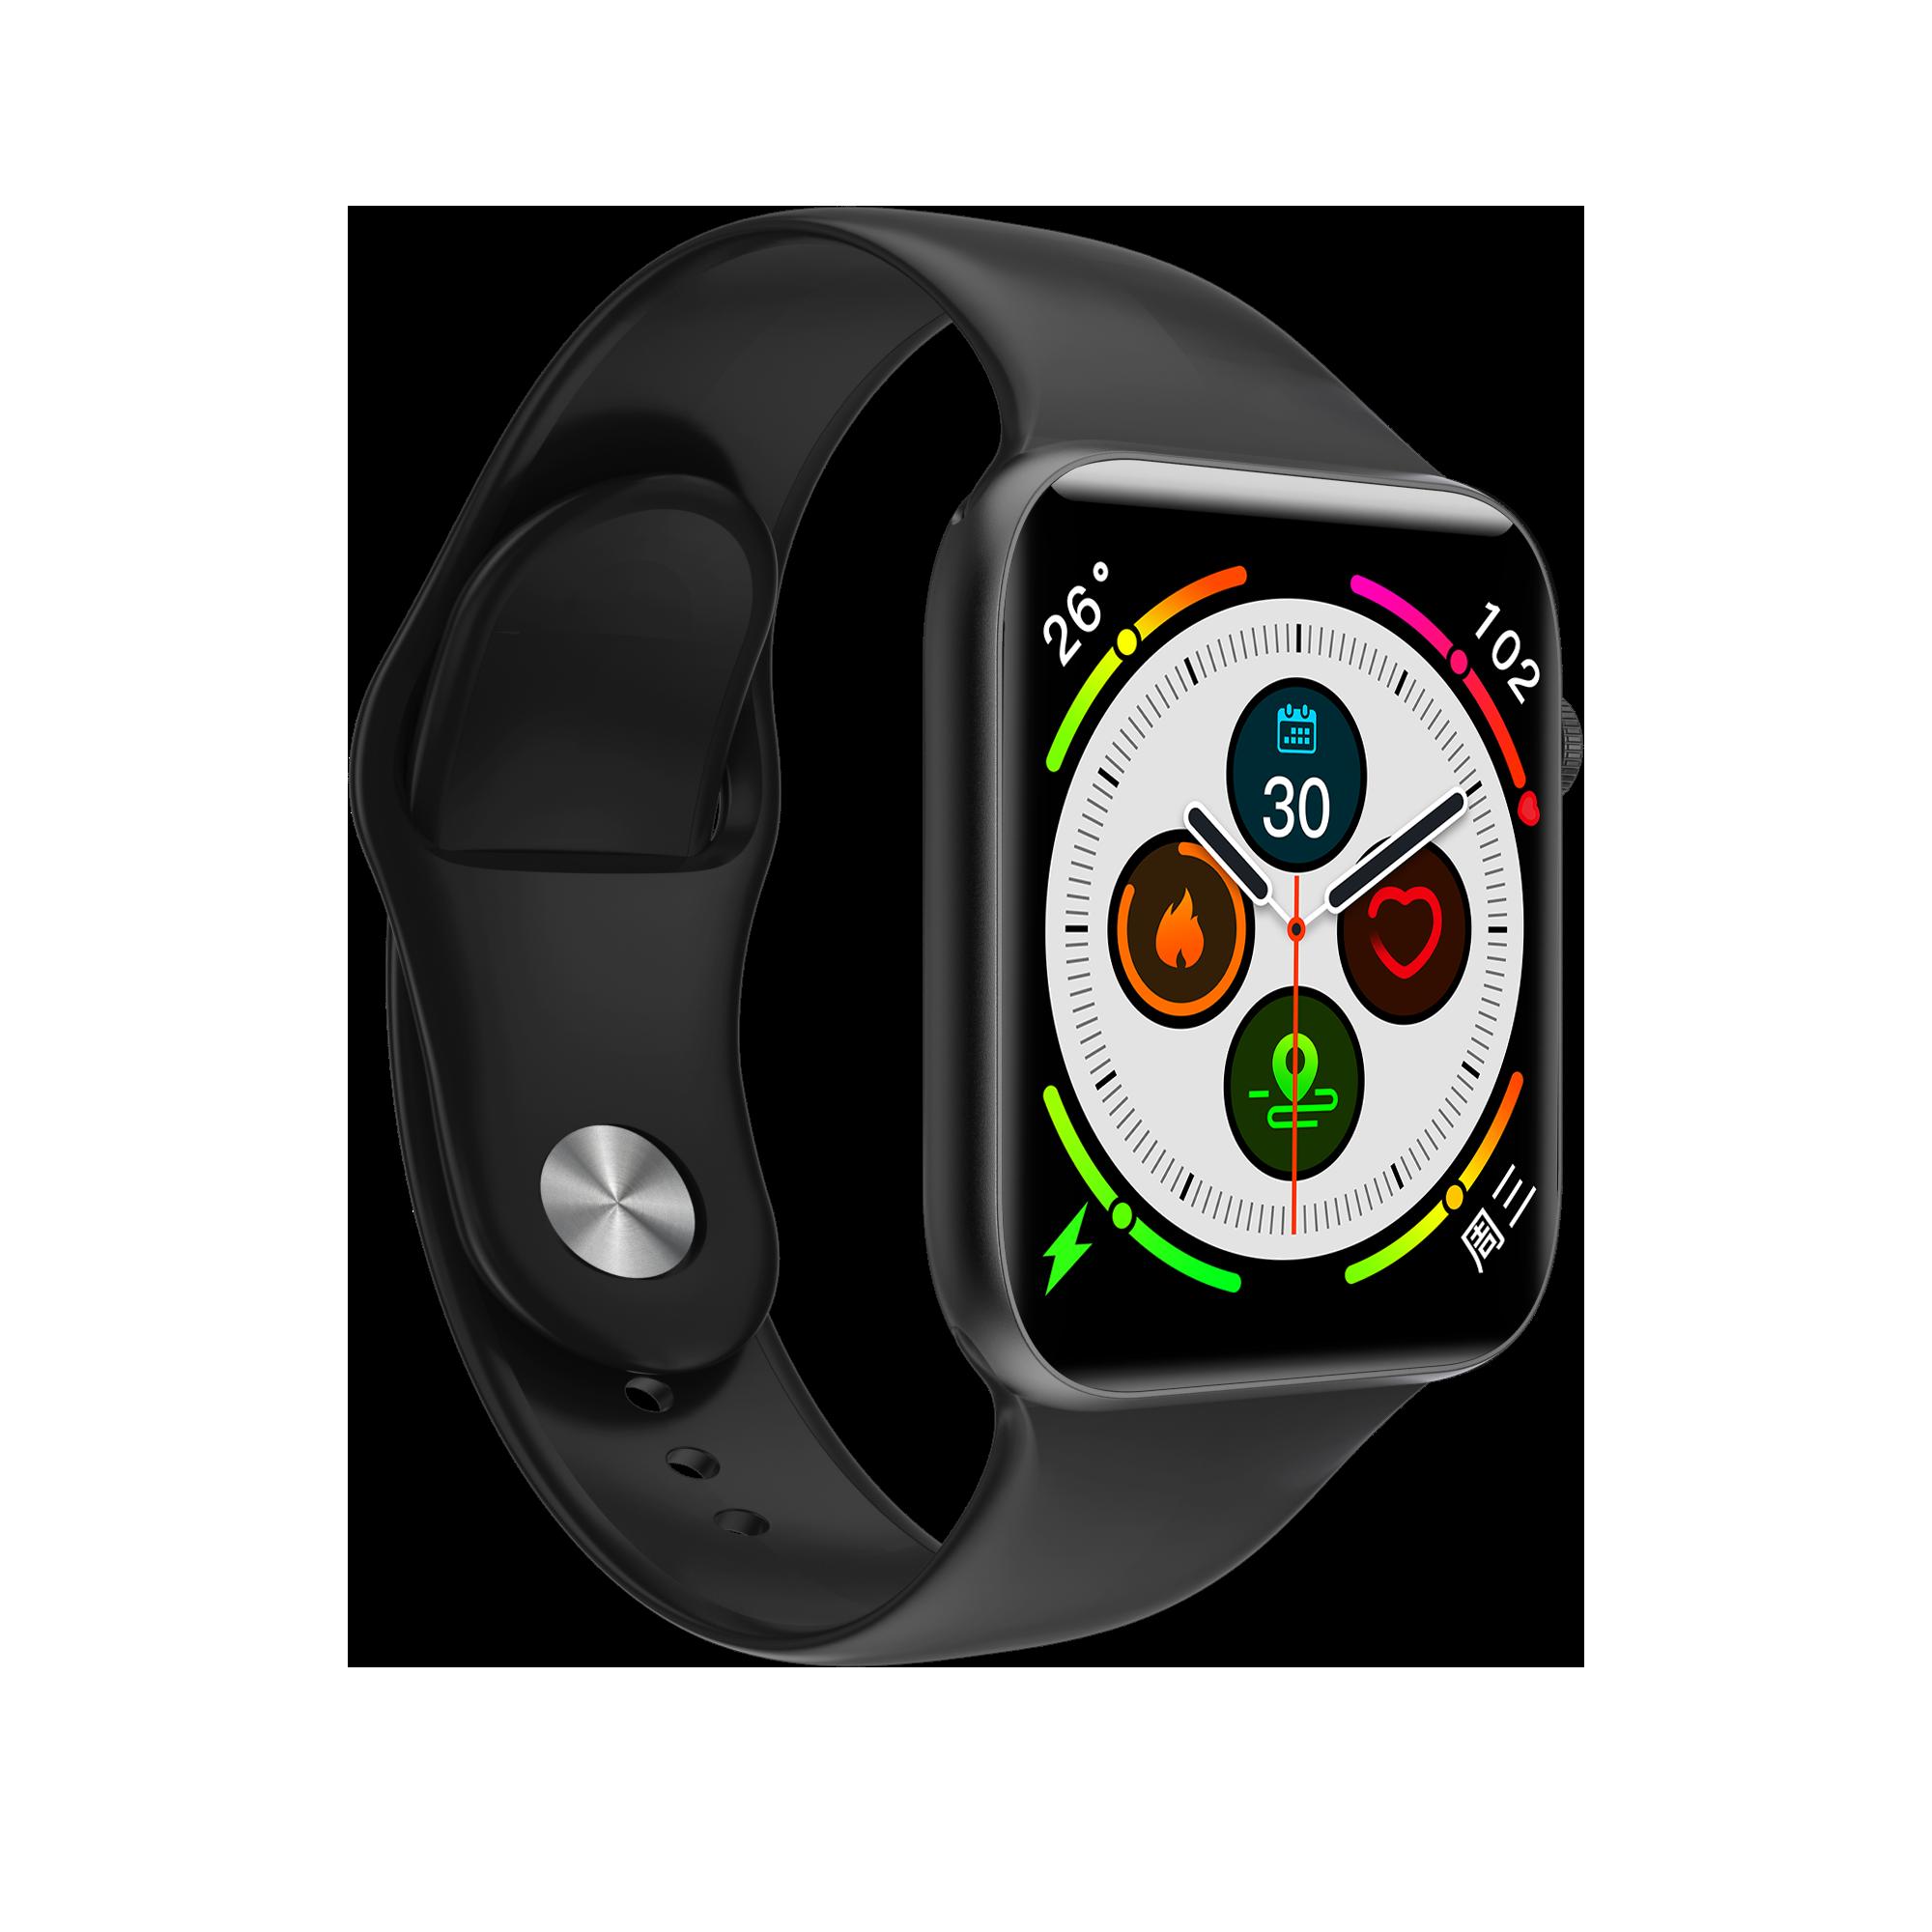 Fobase Air Zone 2 Heart Rate Monitor 8.99mm Super Slim IP68 WaterProof 1.54 inch Bluetooth 5.0 Smart Watch Smart Watches  - AliExpress